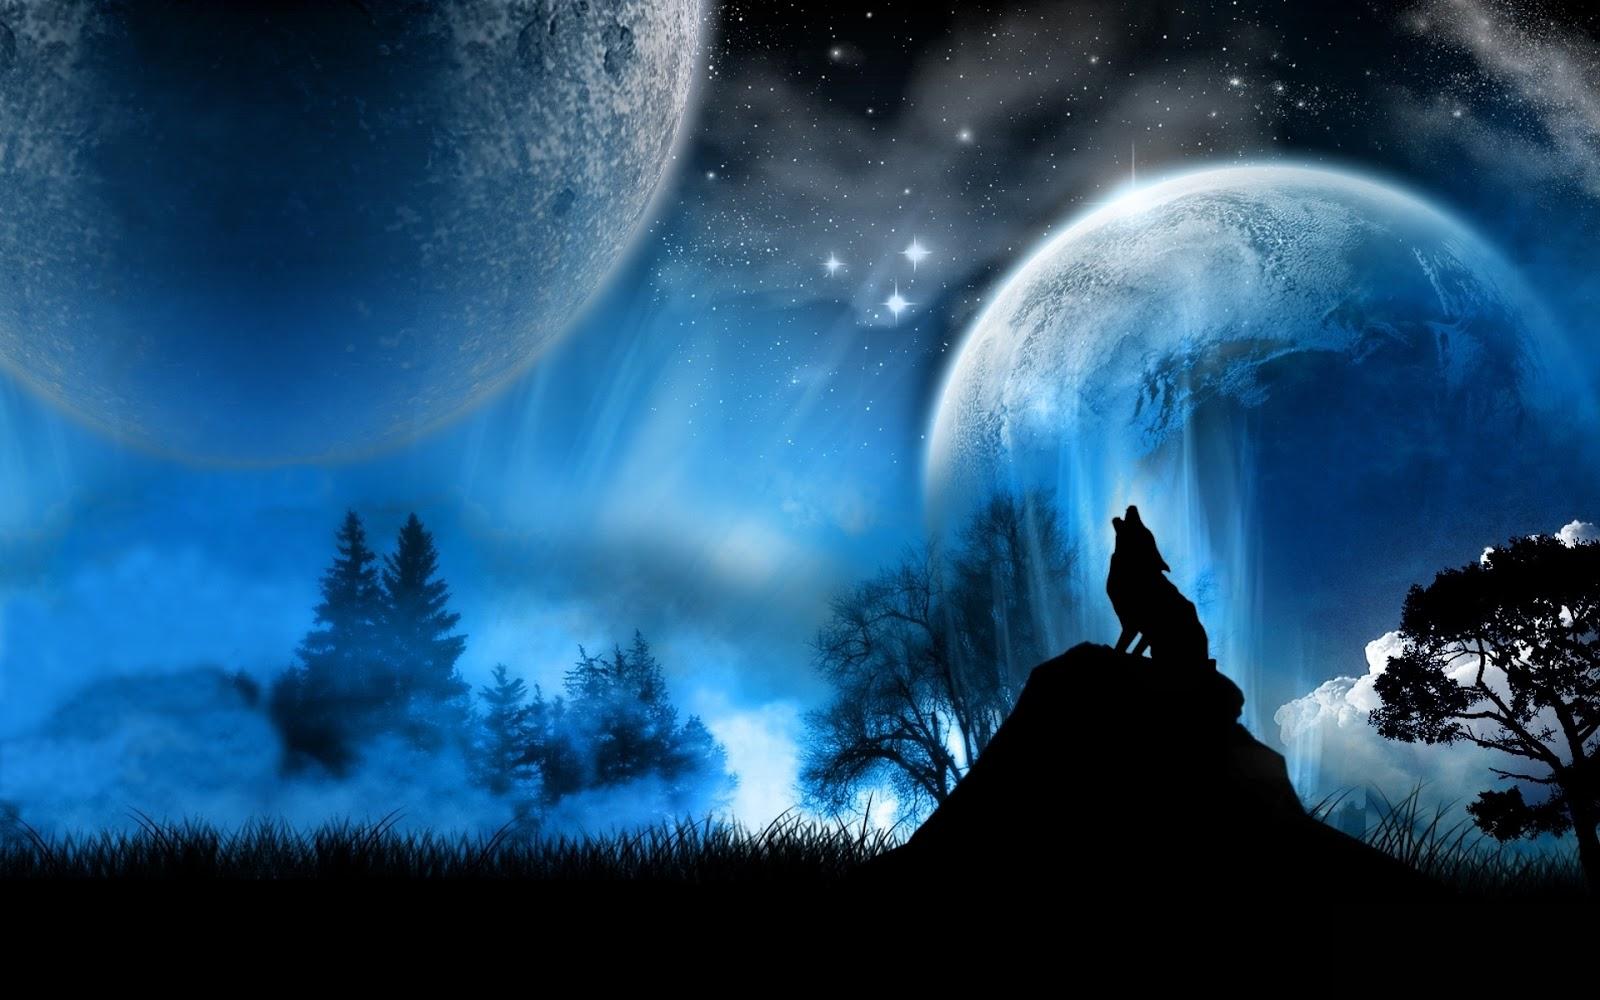 Hq wallpapers 3d wolf photos - 3d anime wallpaper ...